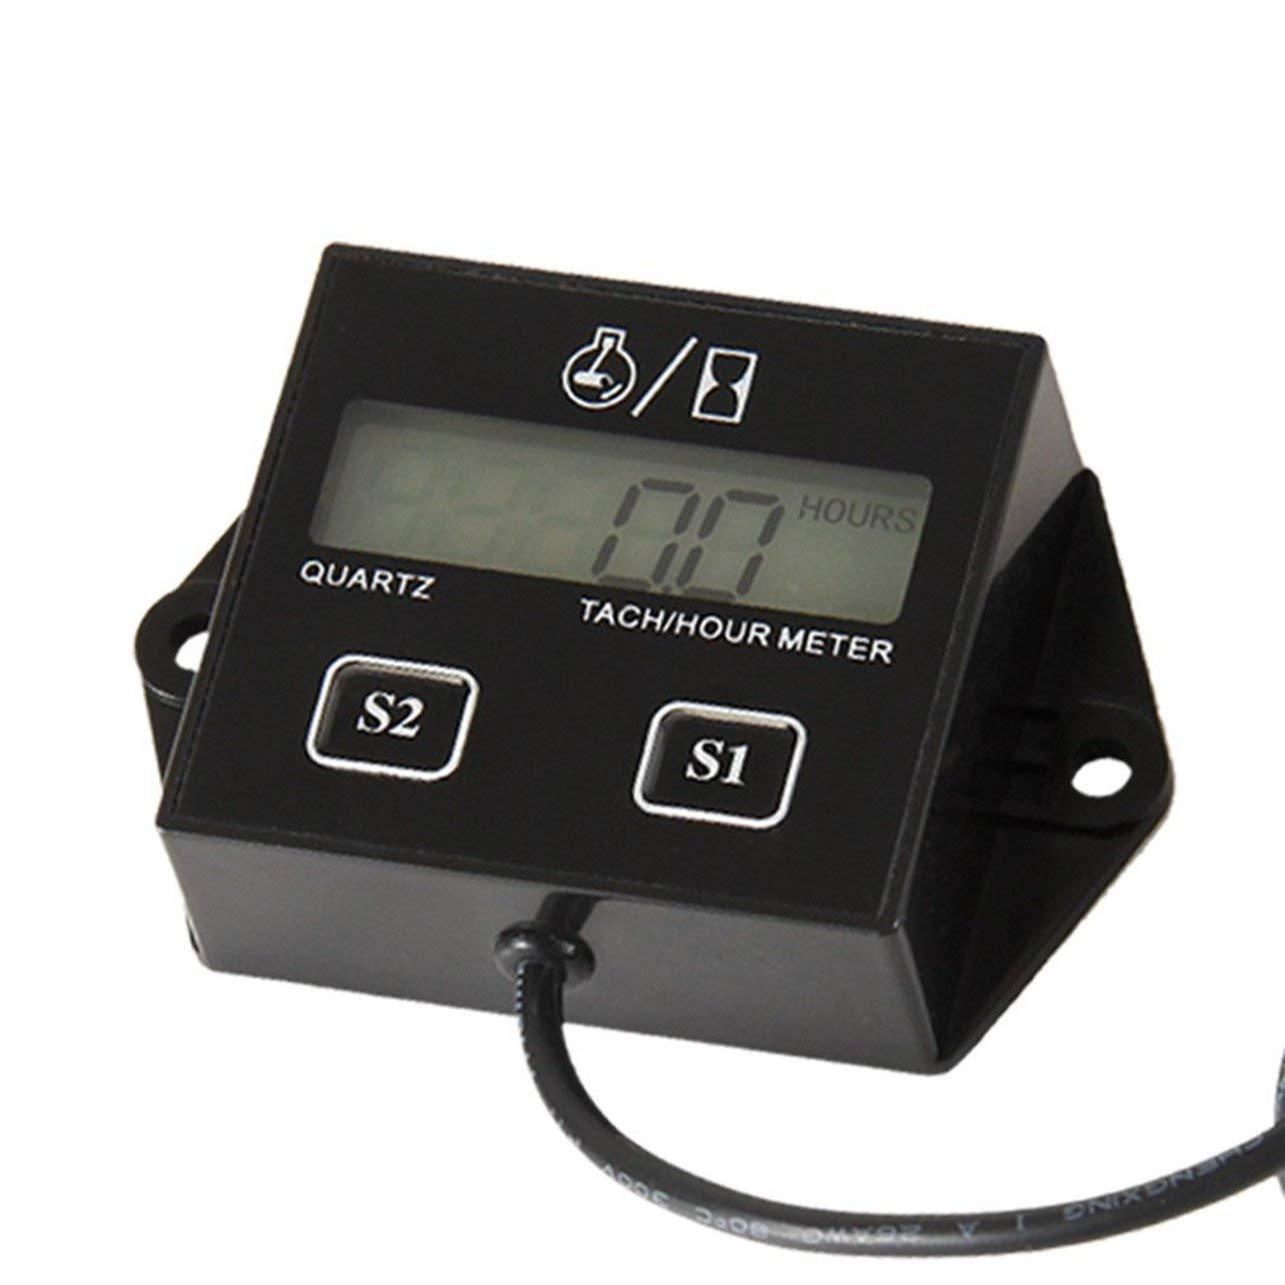 WOSOSYEYO High Performance Auto Digital Motor Tach Tachometer Stundenzä hler Induktive fü r Motorrad Auto Motor Hub Motor